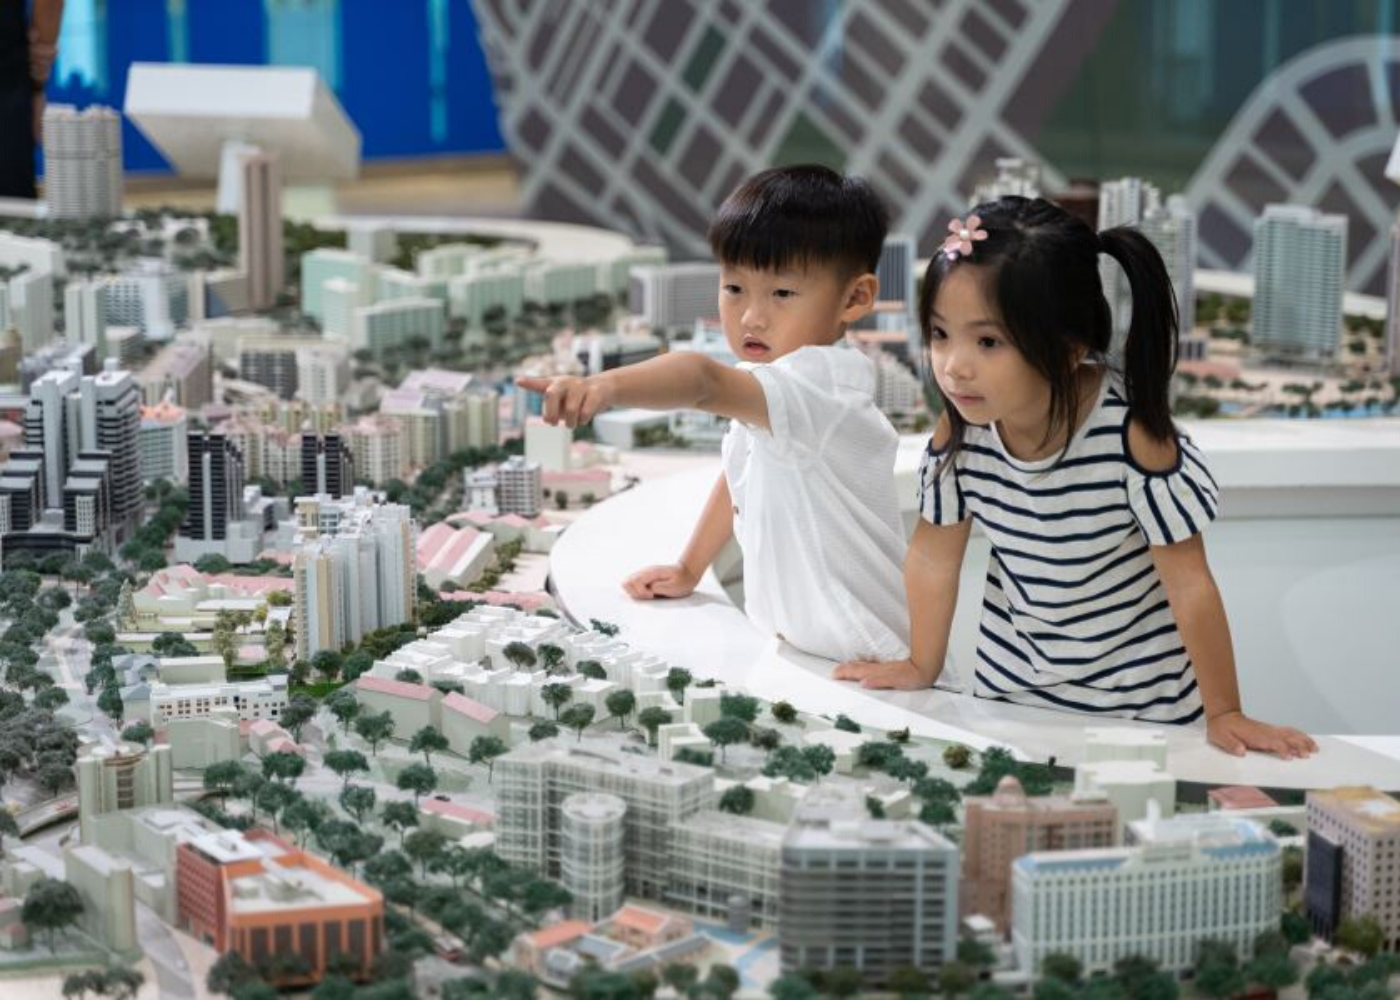 Singapore City Gallery, Urban Redevelopment Authority